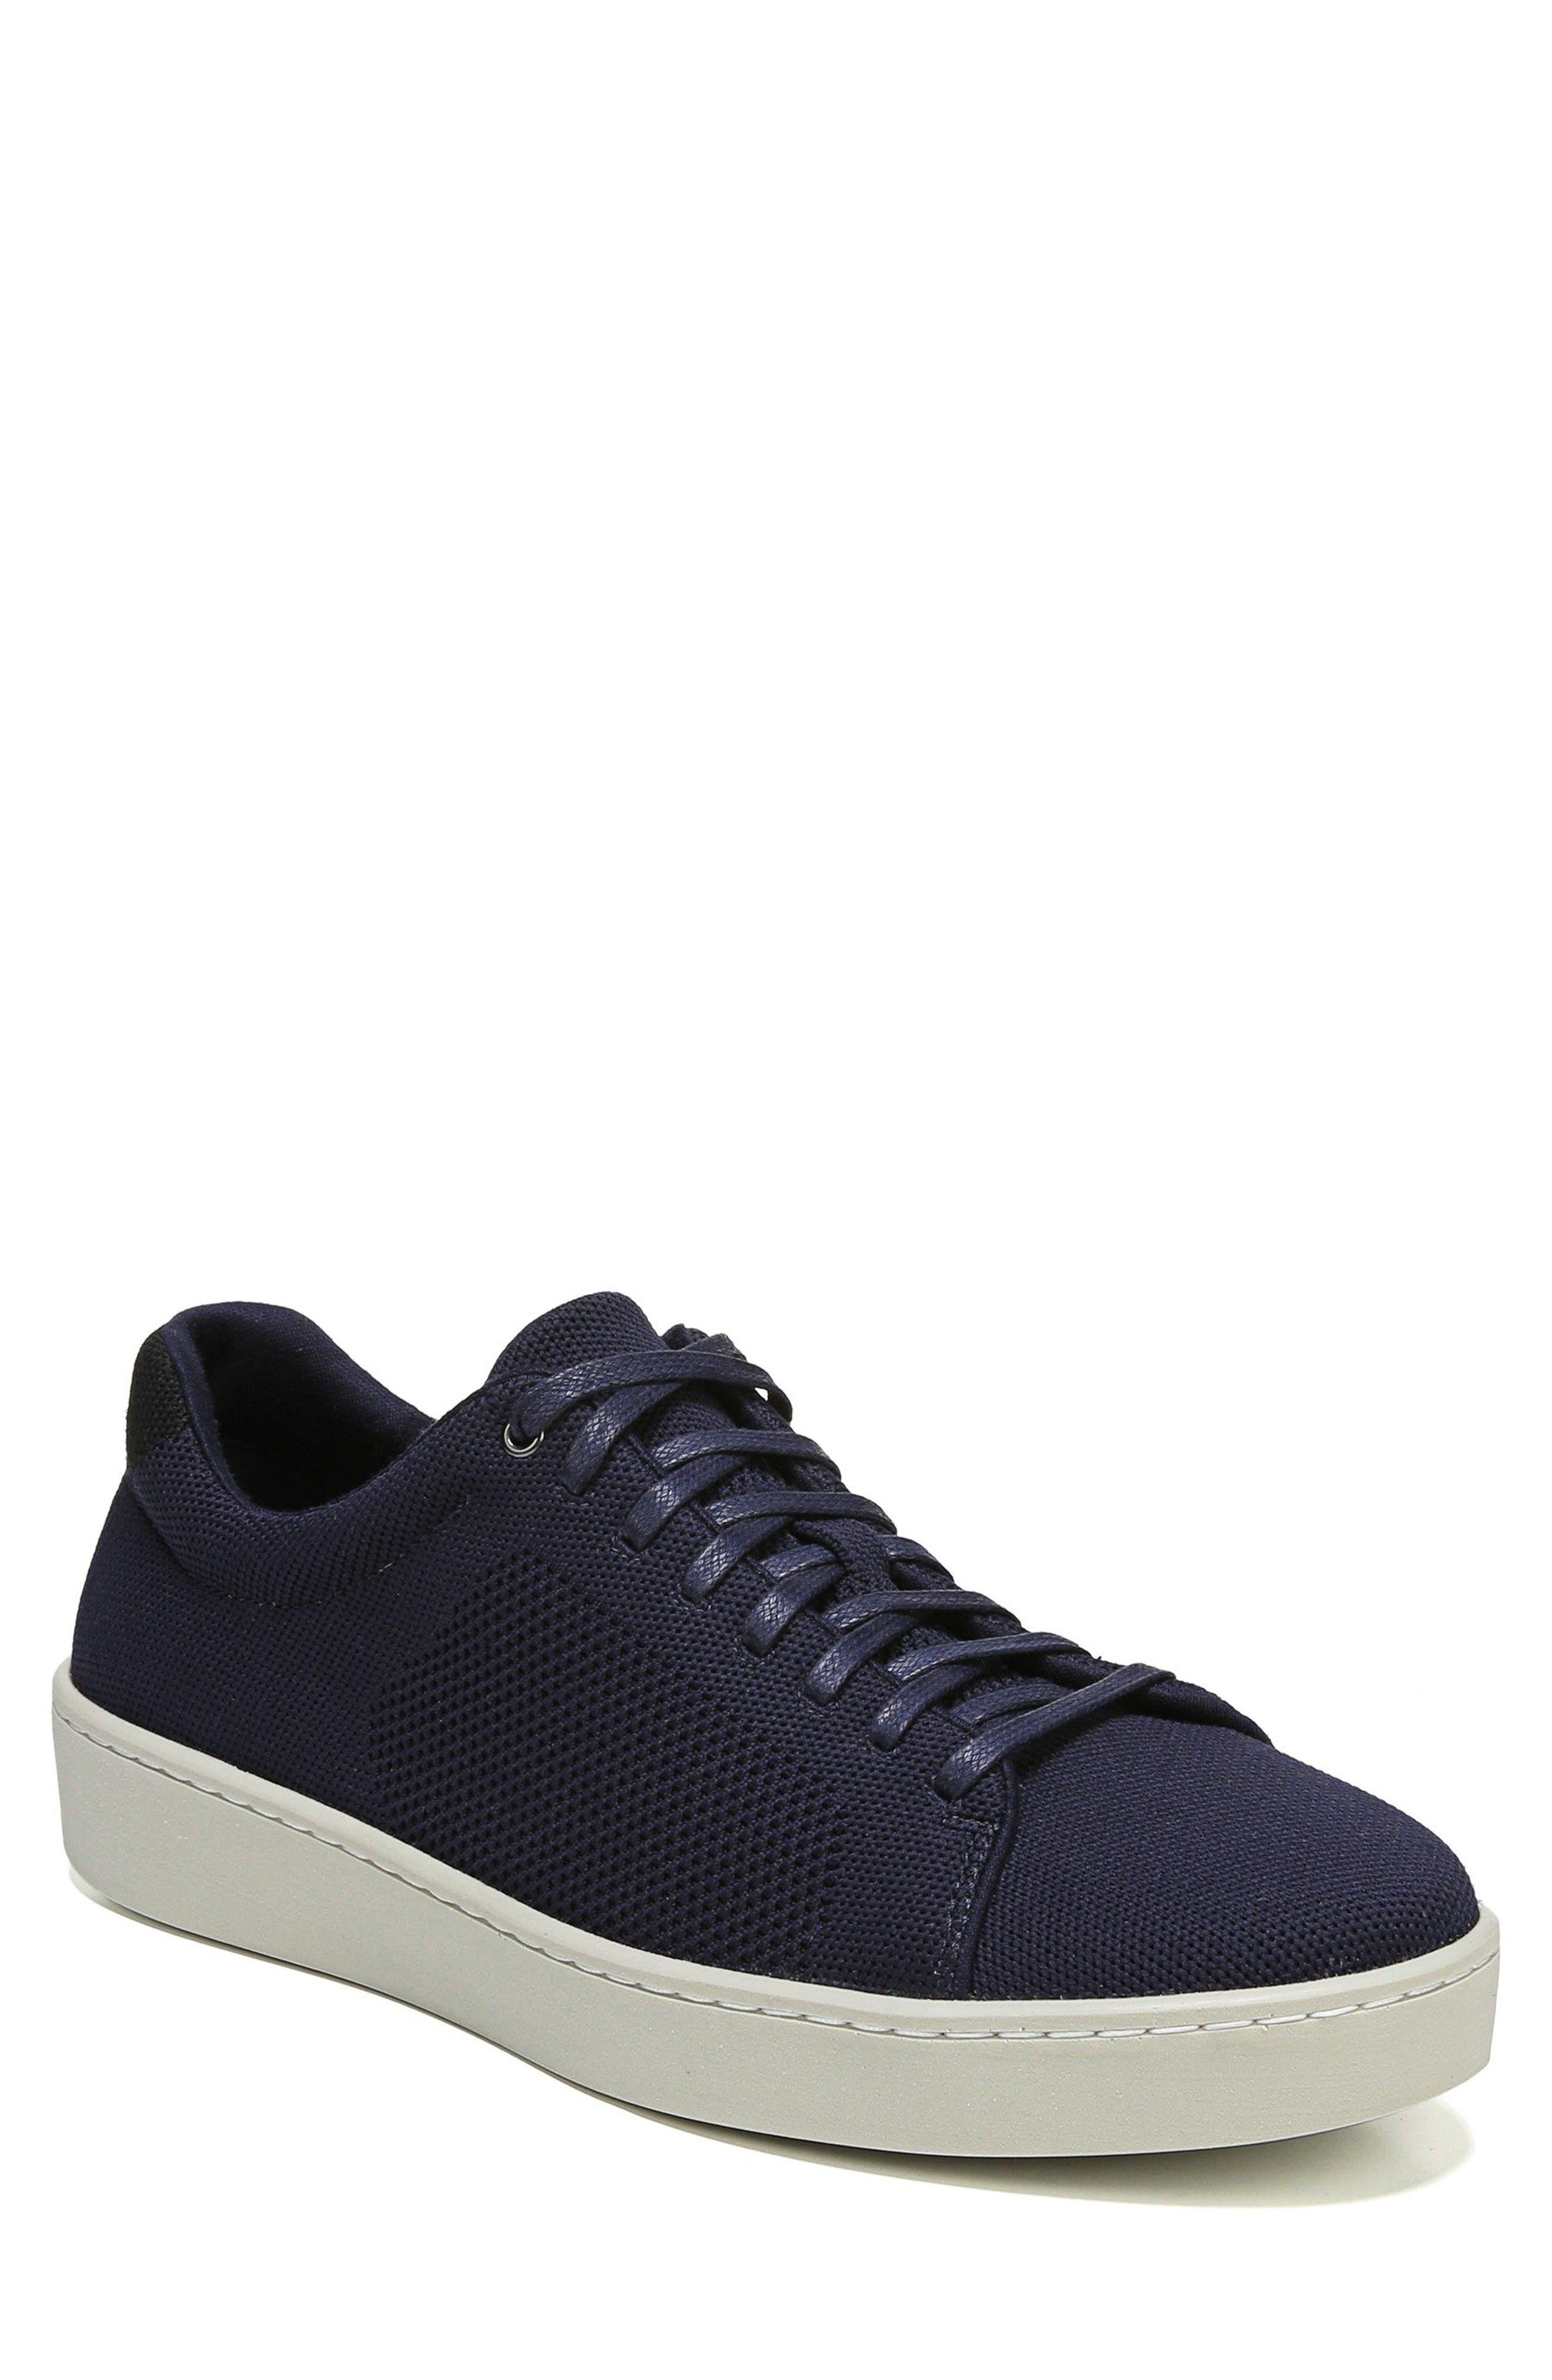 Silos Knit Low Top Sneaker,                             Main thumbnail 1, color,                             COASTAL